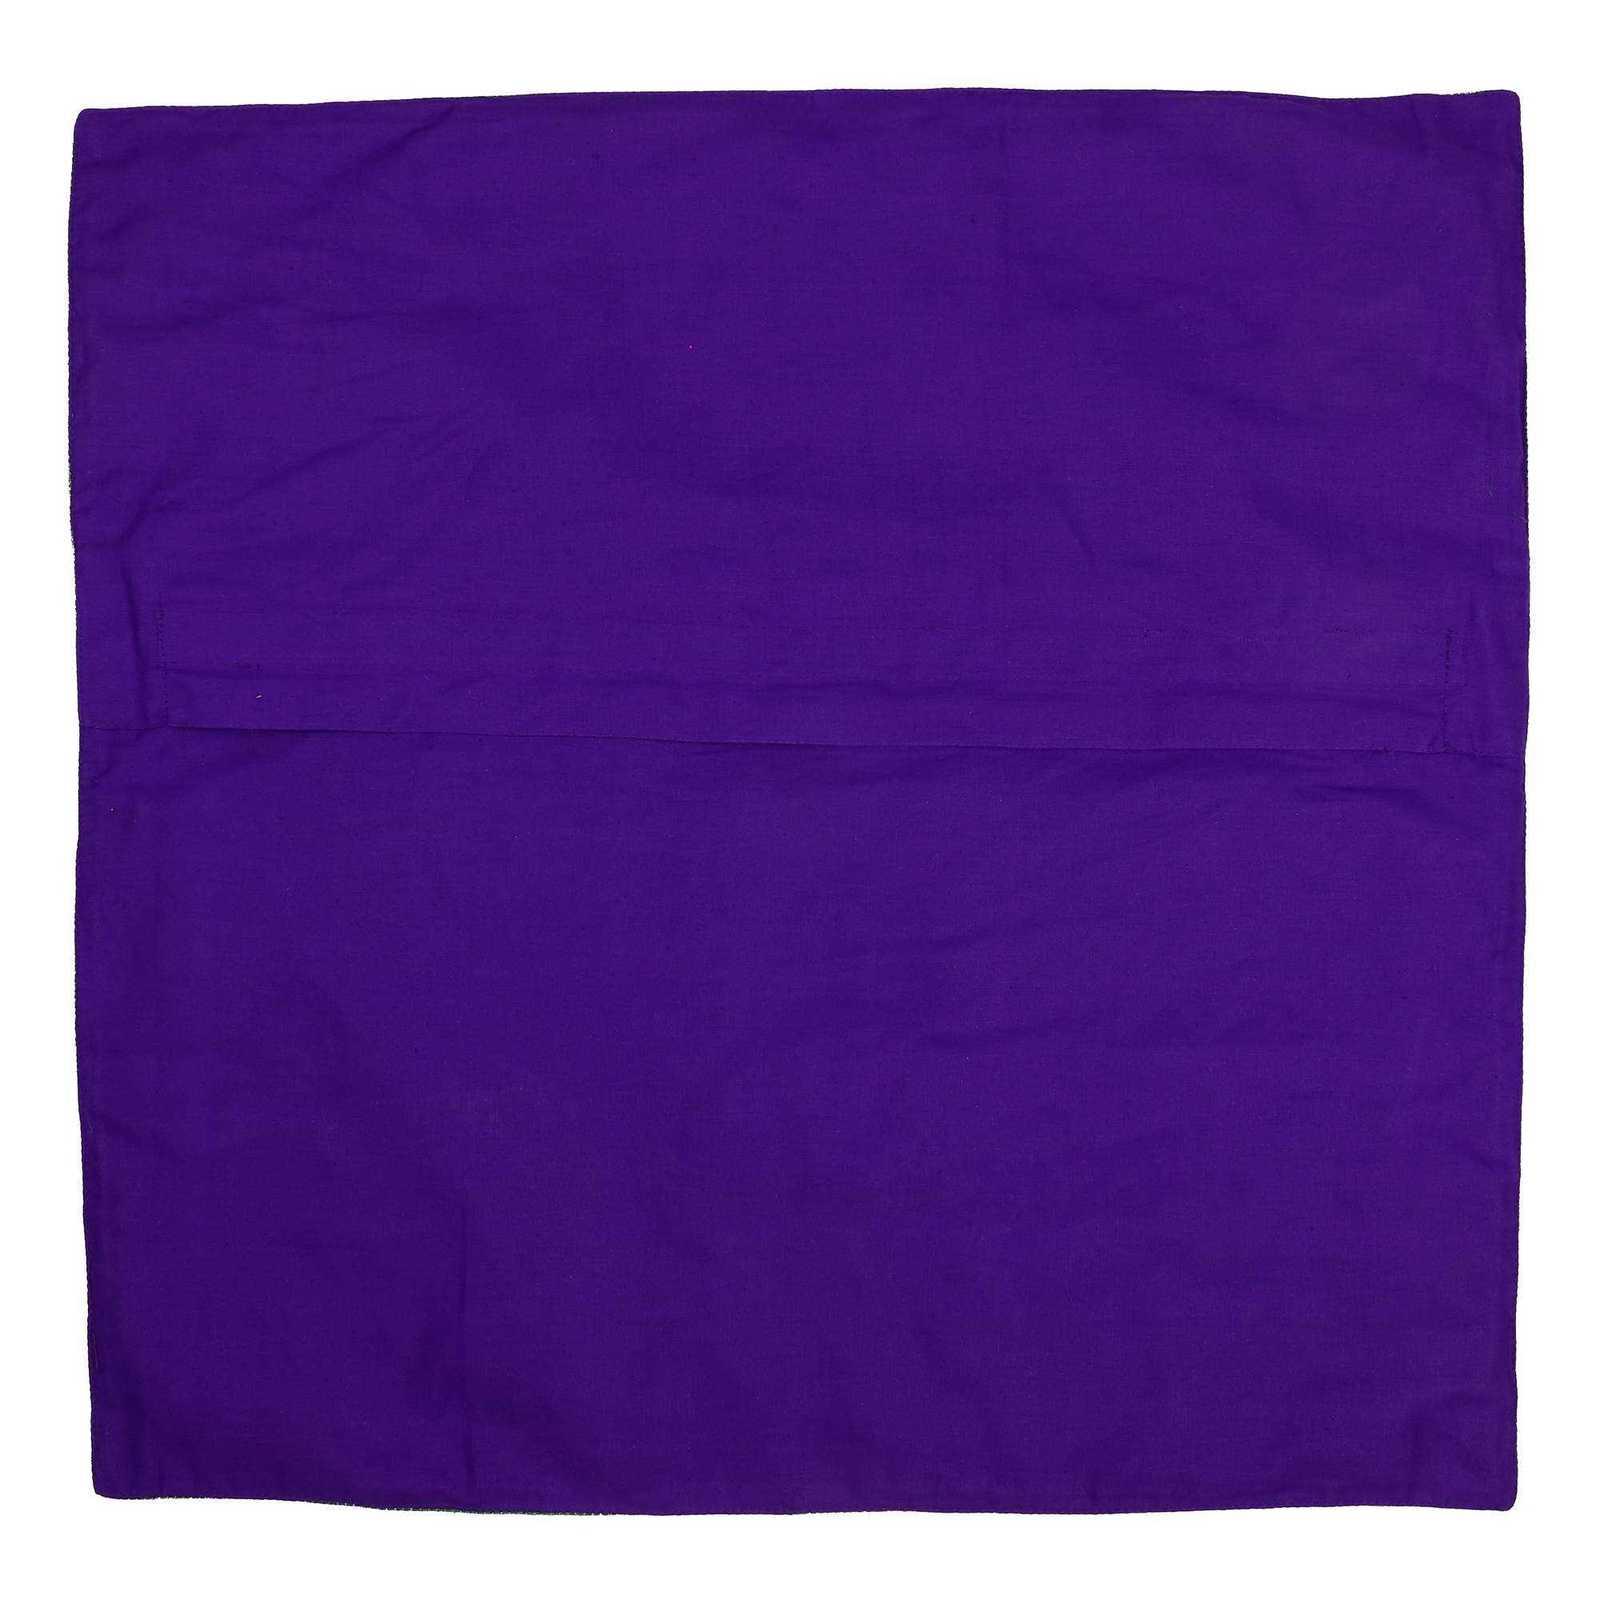 Indian Decorative Silk Cushion Pillow Covers 24 X 24 Sofa  : cushioncoversvioletblue24x241 from www.bonanza.com size 1600 x 1600 jpeg 70kB